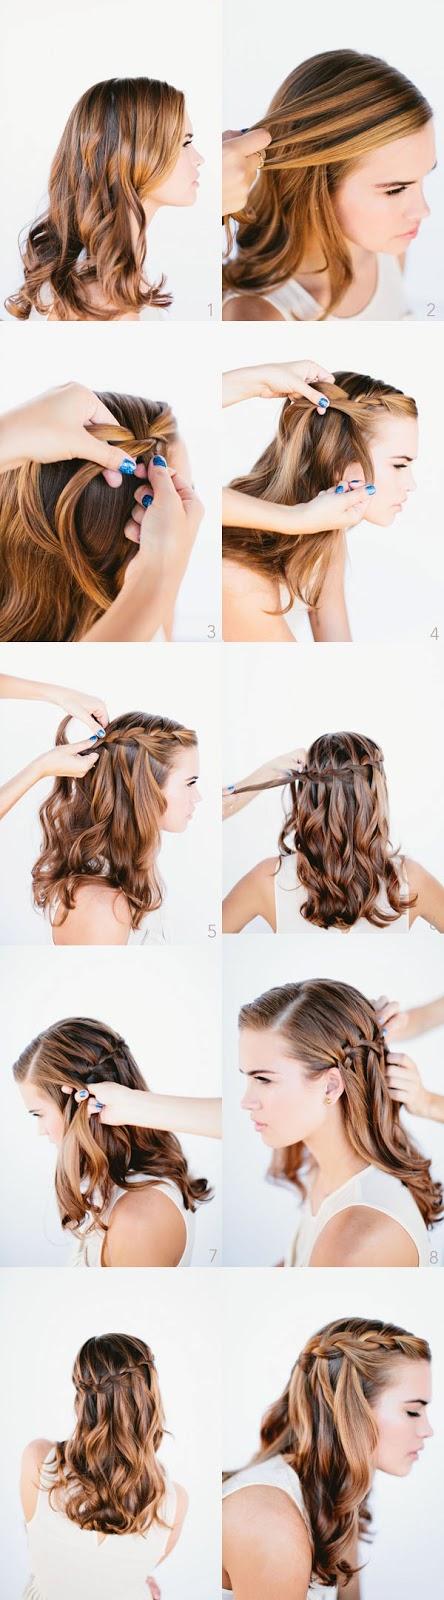 Peinados de trenzas modernas paso a paso elainacortez - Como hacer peinados faciles y bonitos ...